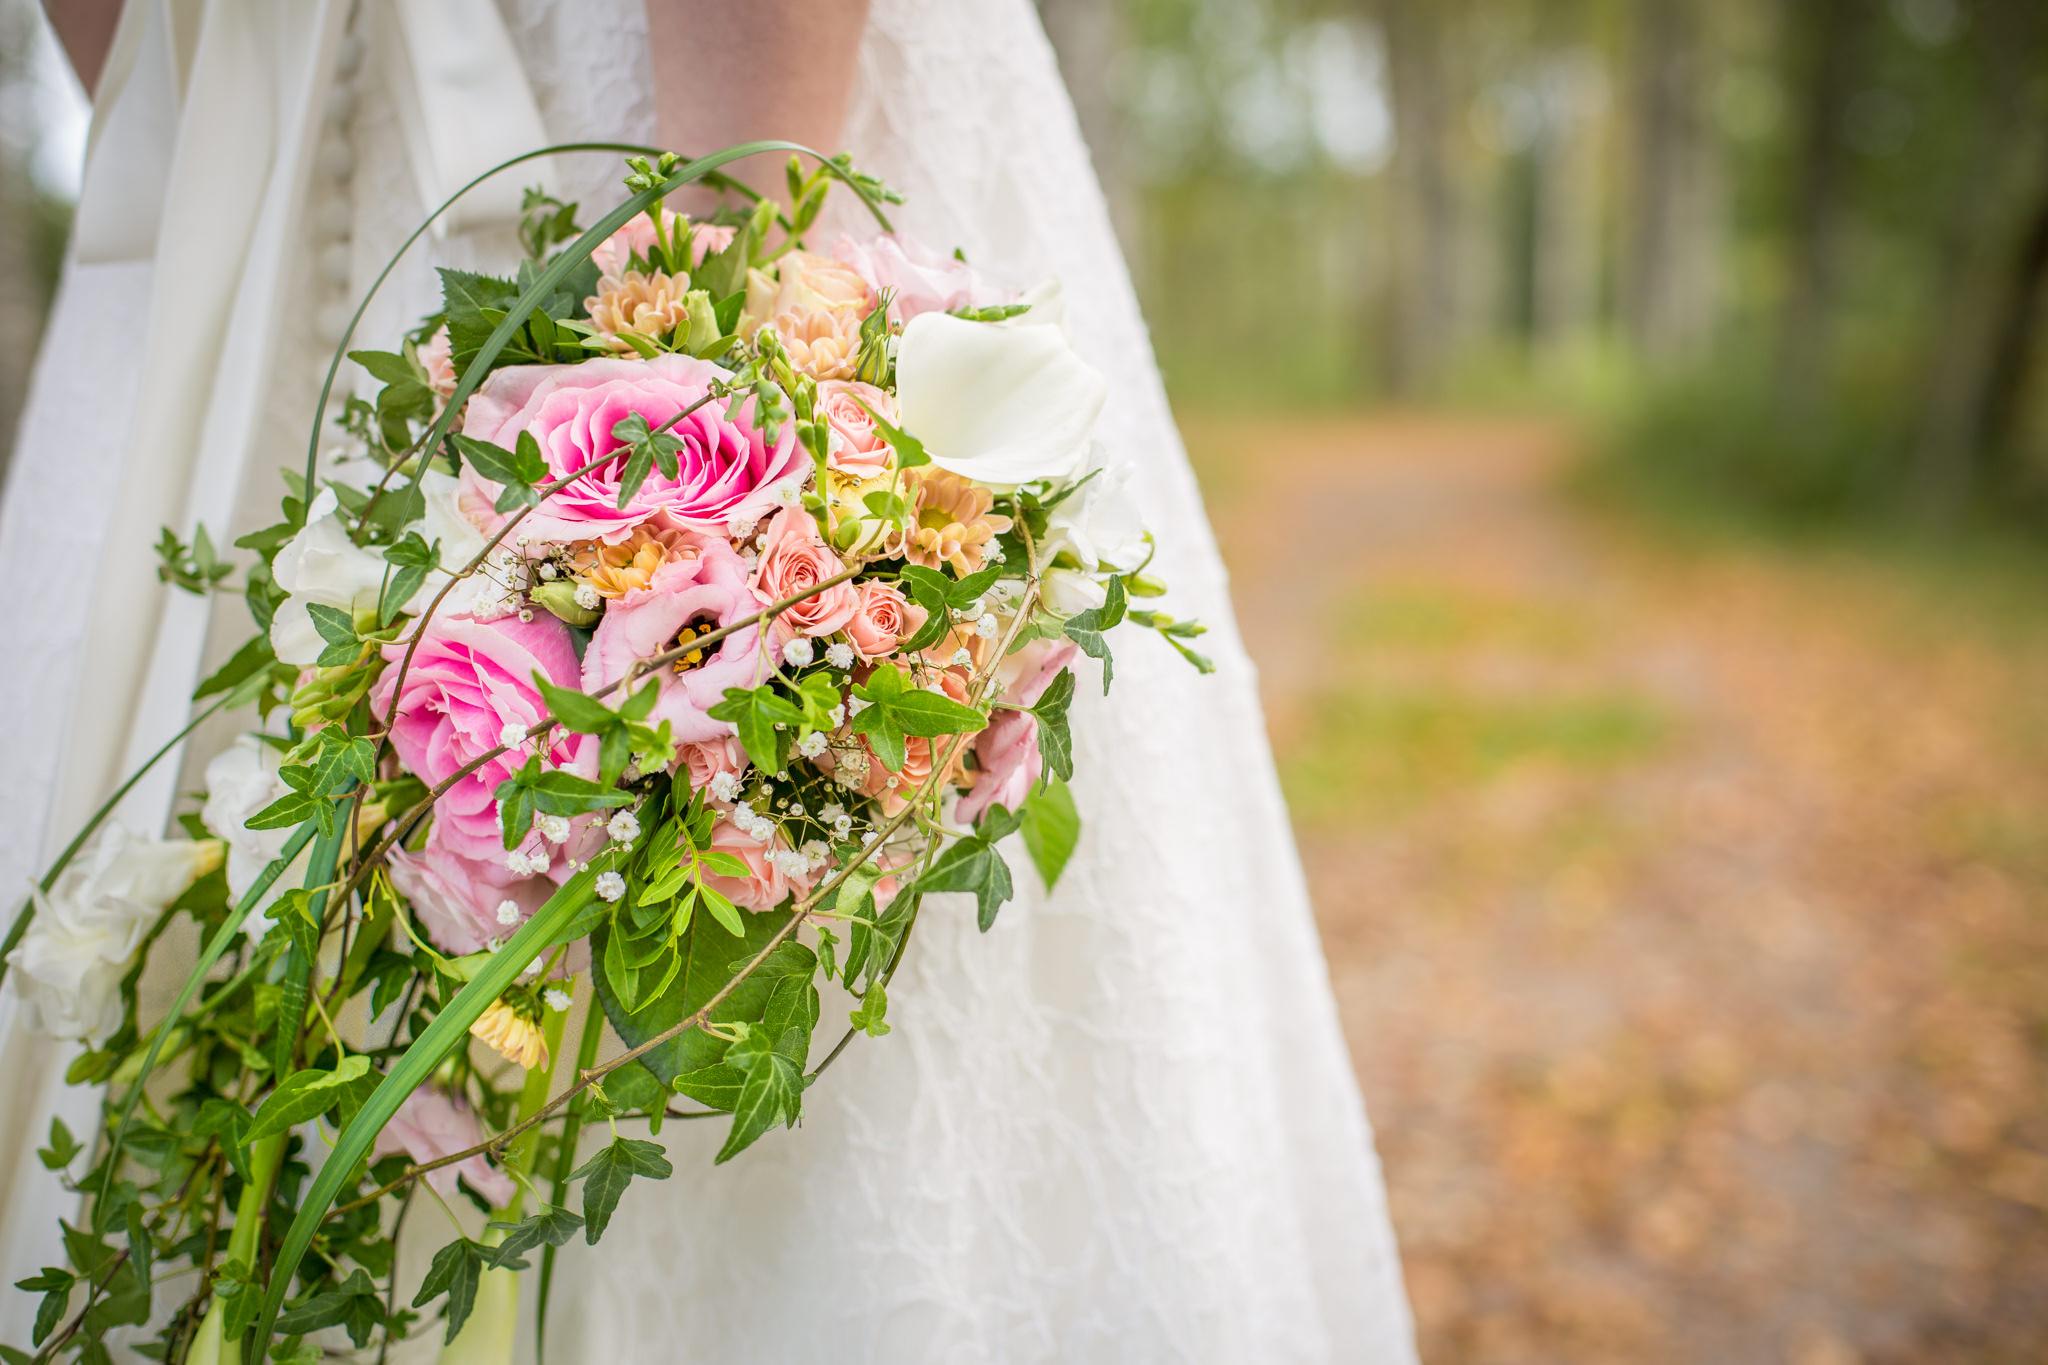 160917 Bröllop-375.jpg